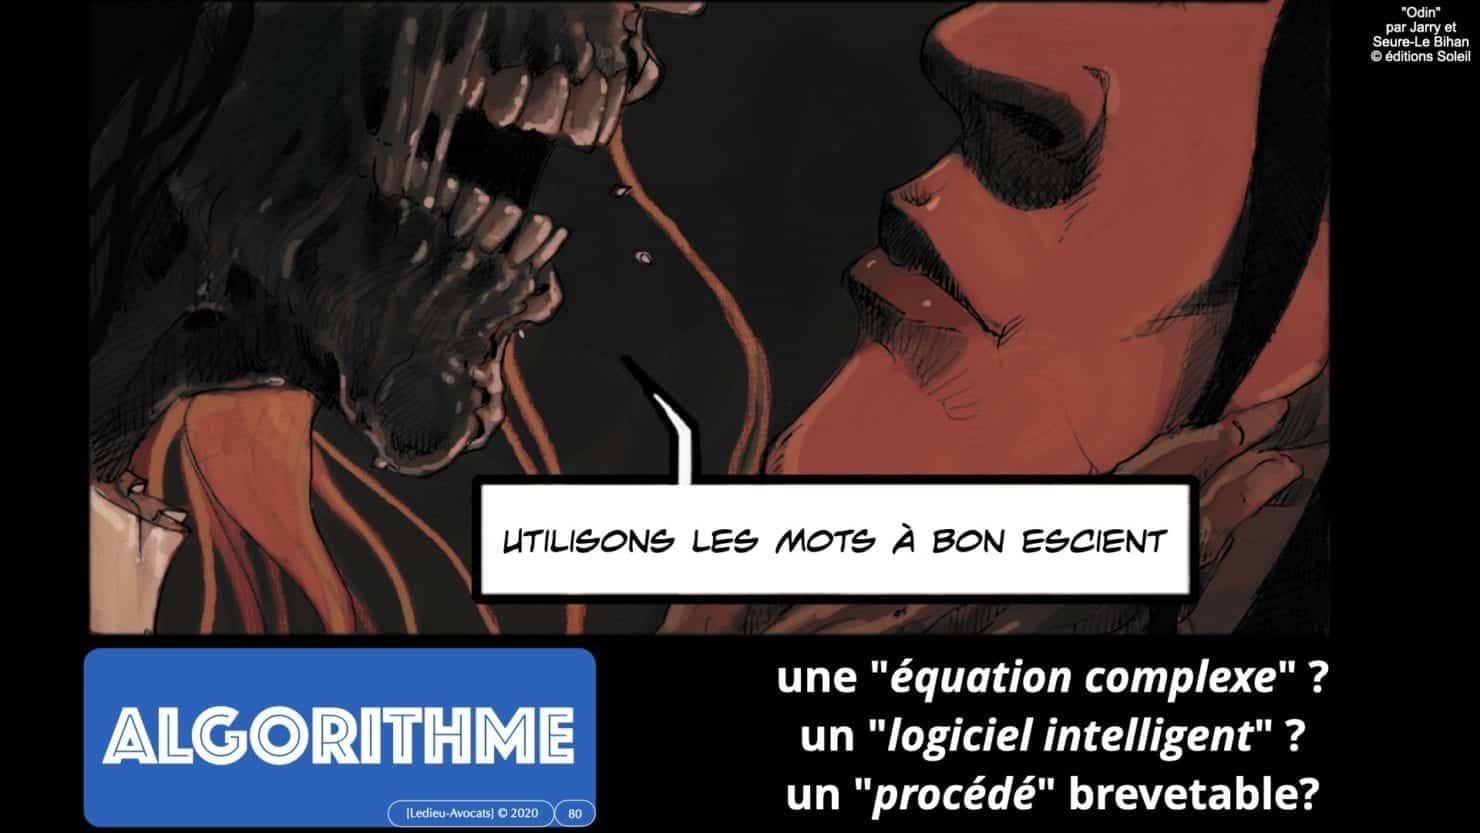 307 Intelligence artificielle-machine-learning-deep-learning-base de données-BIG-DATA *16:9* Constellation ©Ledieu-Avocat-13-10-2020.080